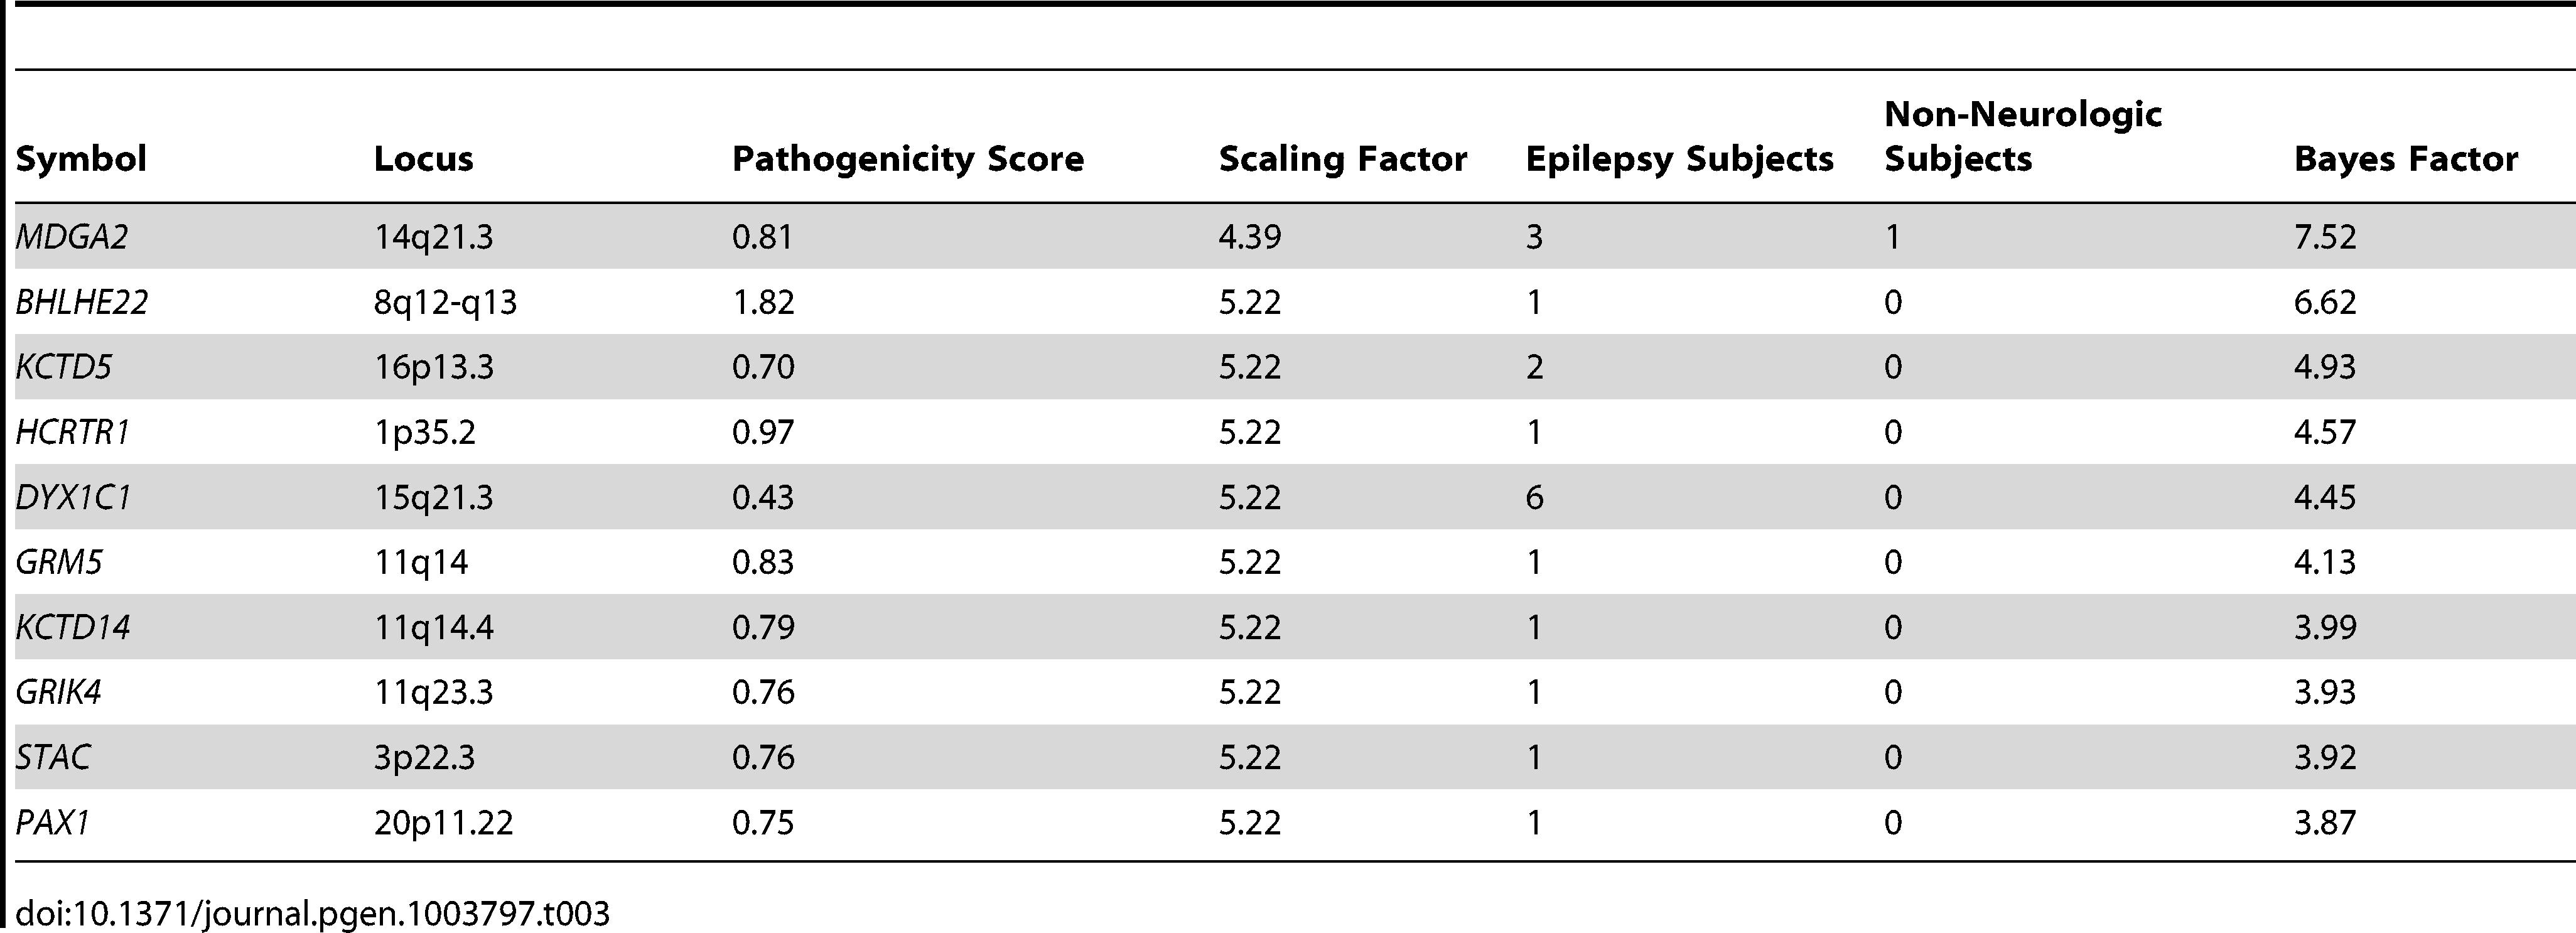 Bayes factors of interesting novel candidate genes in epilepsy.